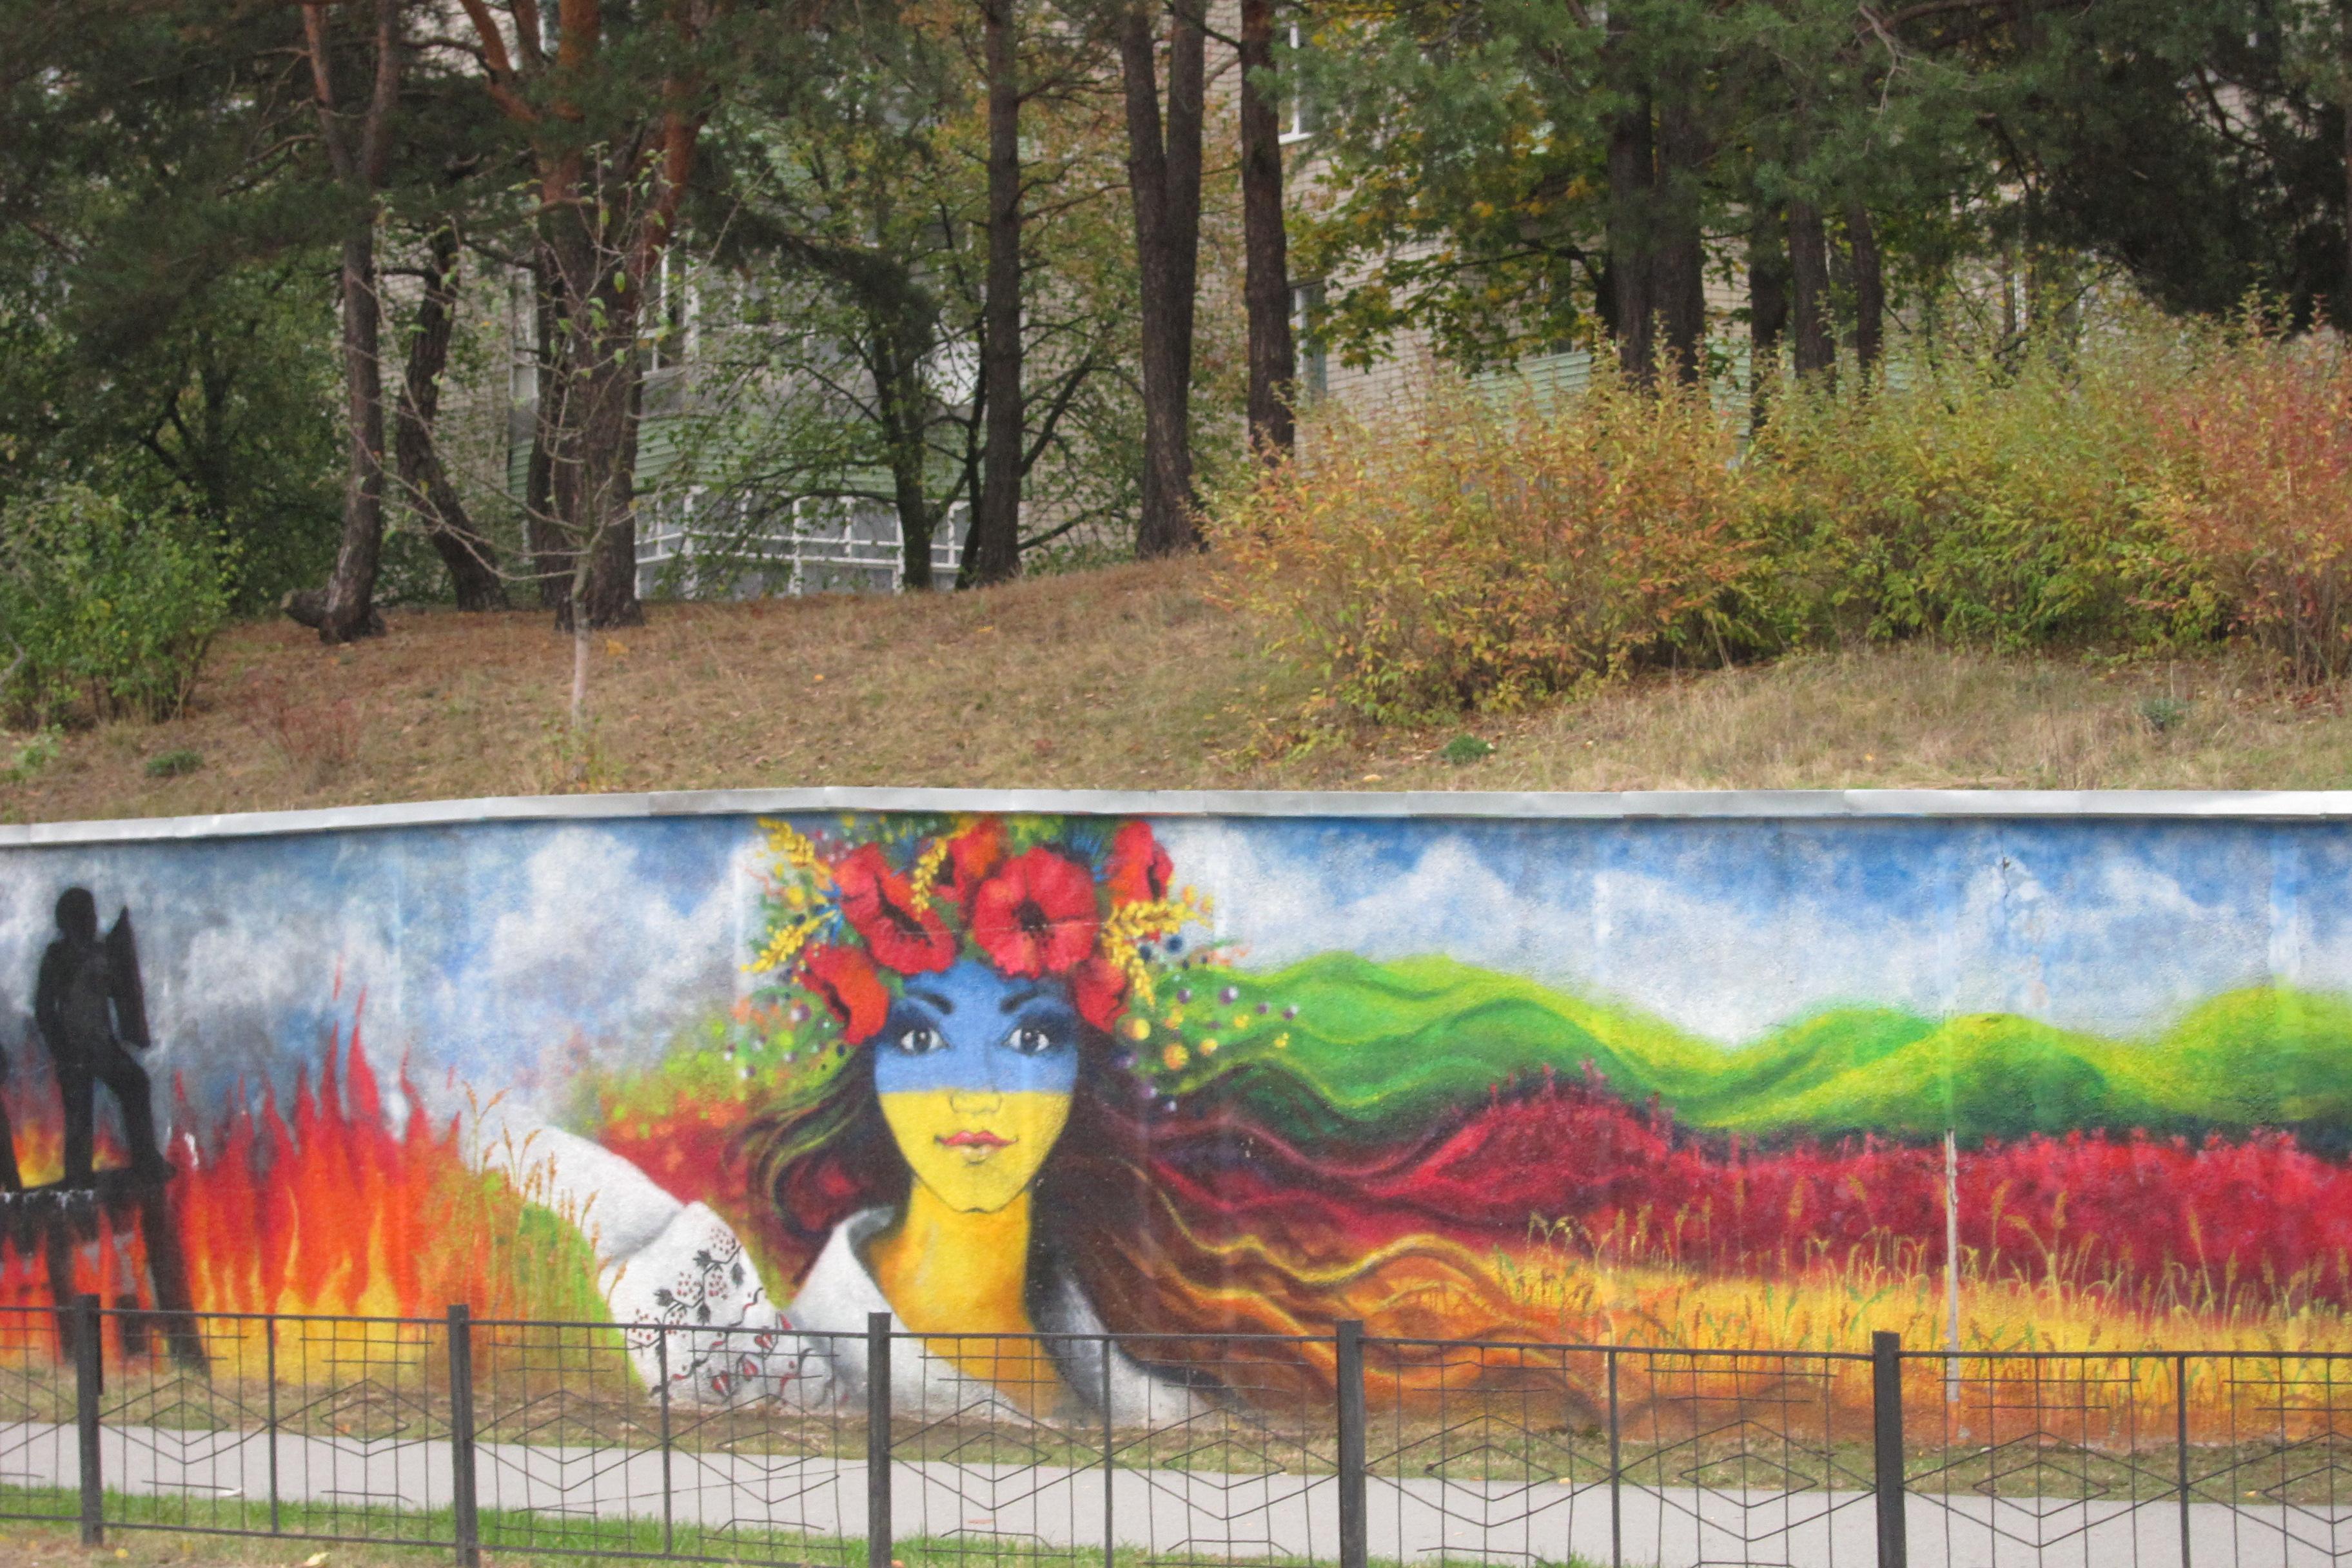 Reise durch Polesiens Atomstädte 2, Foto: Svetlana Boltovskaja